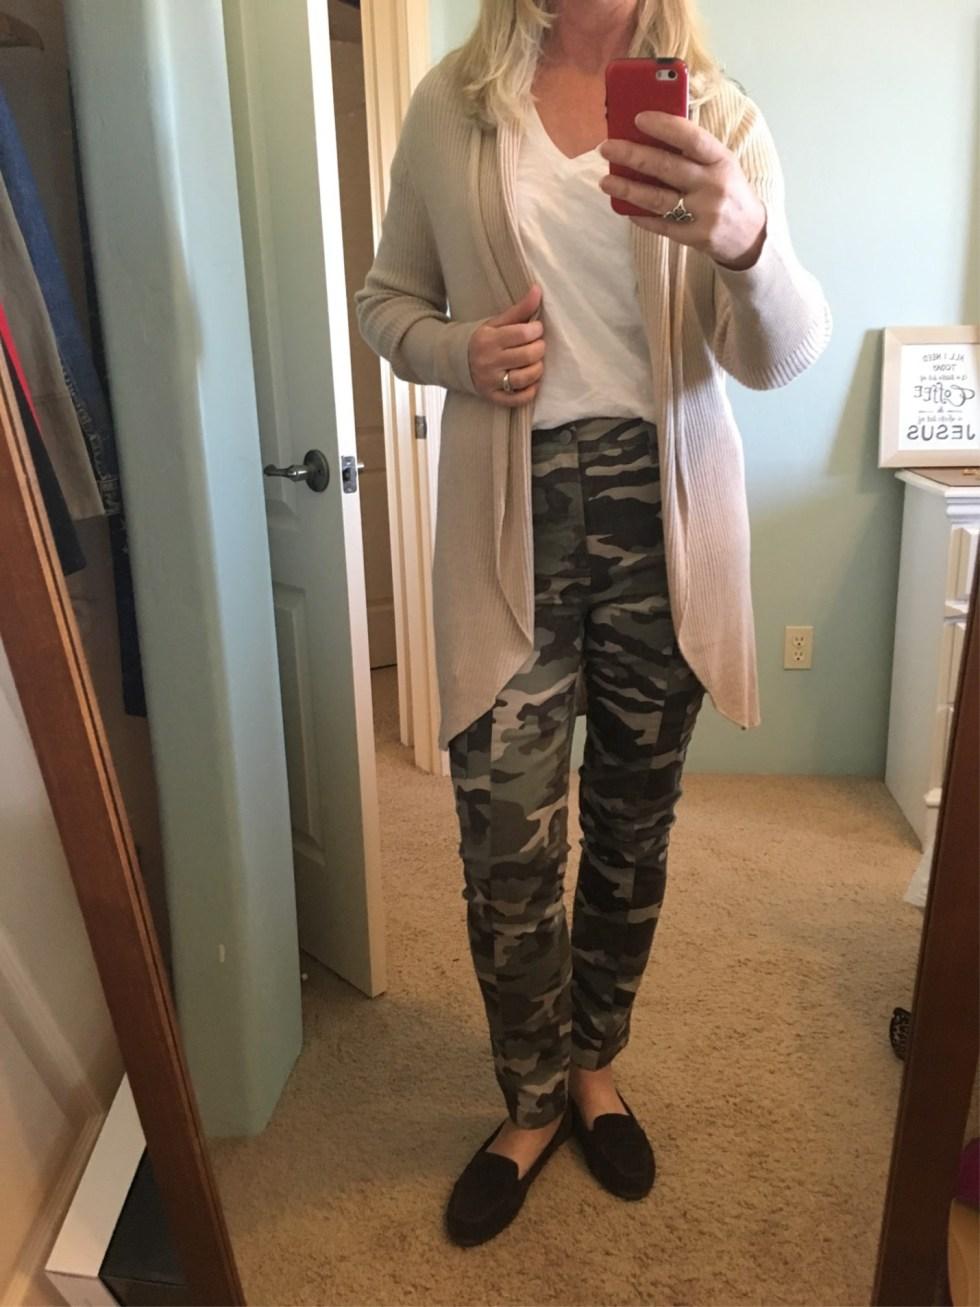 2 Ways to Style Camo + More Ideas